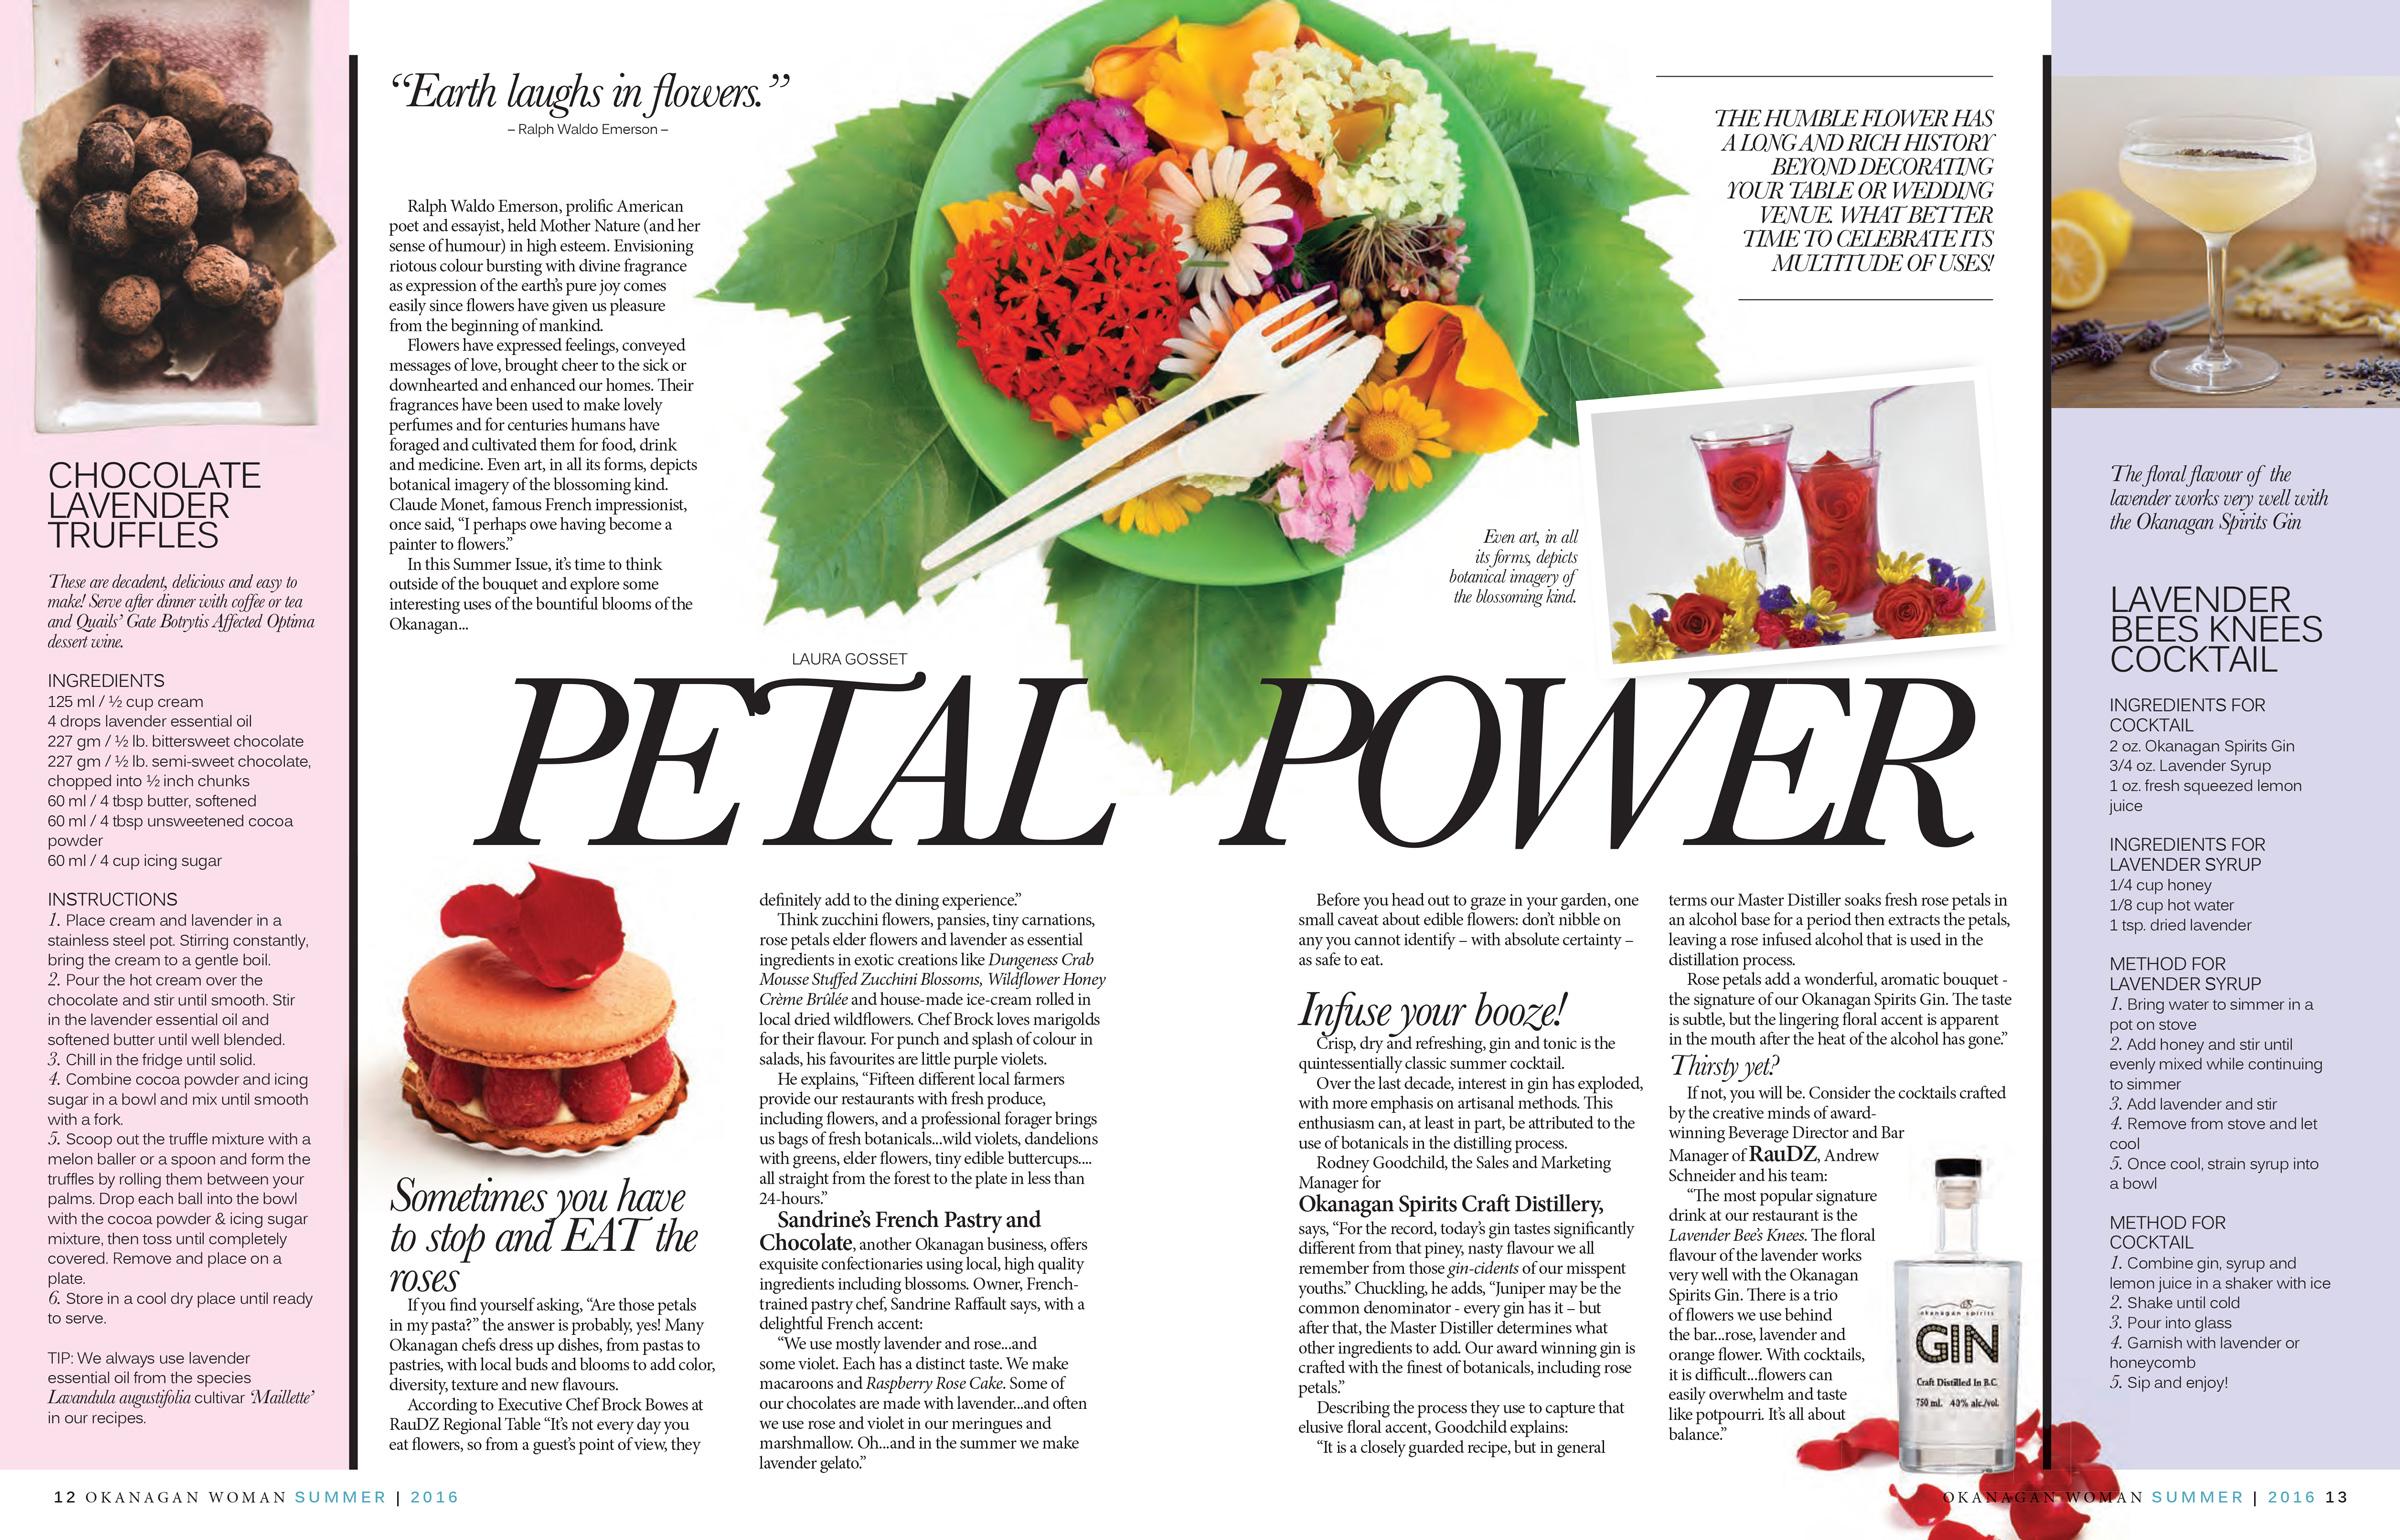 Petal-Power-1-2400pxW.jpg